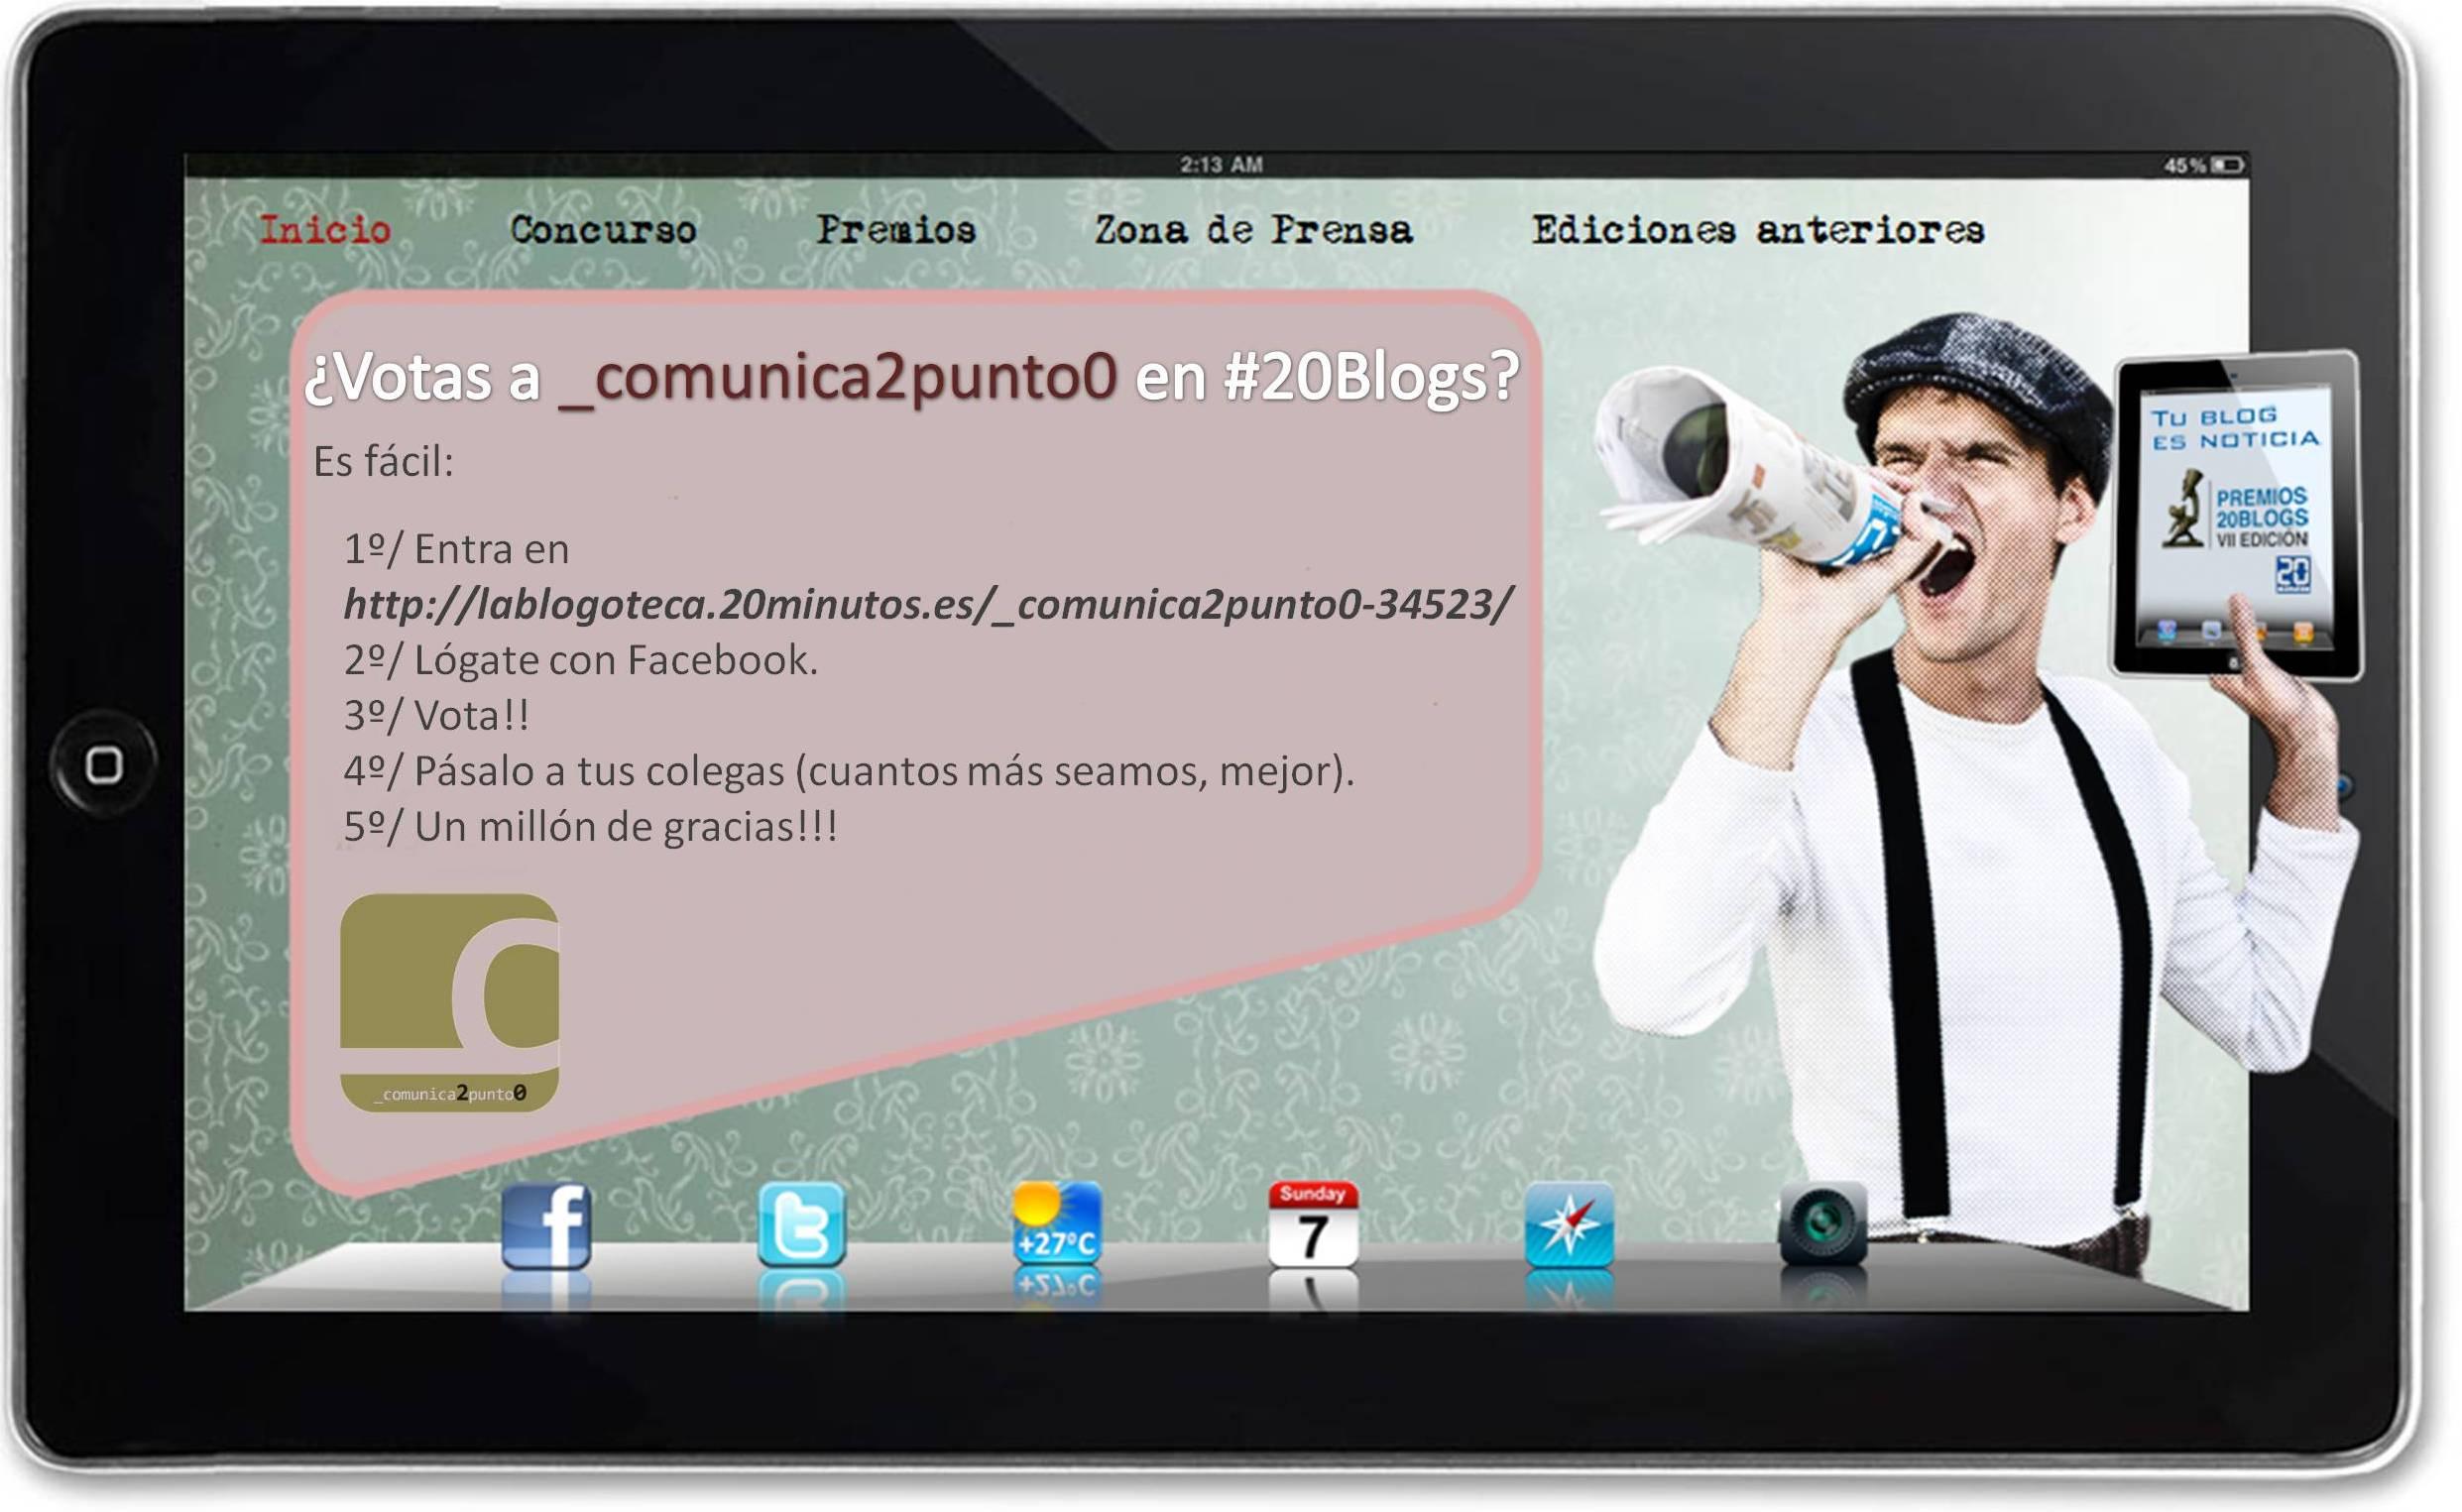 20blogs-comunica2punto0-vota